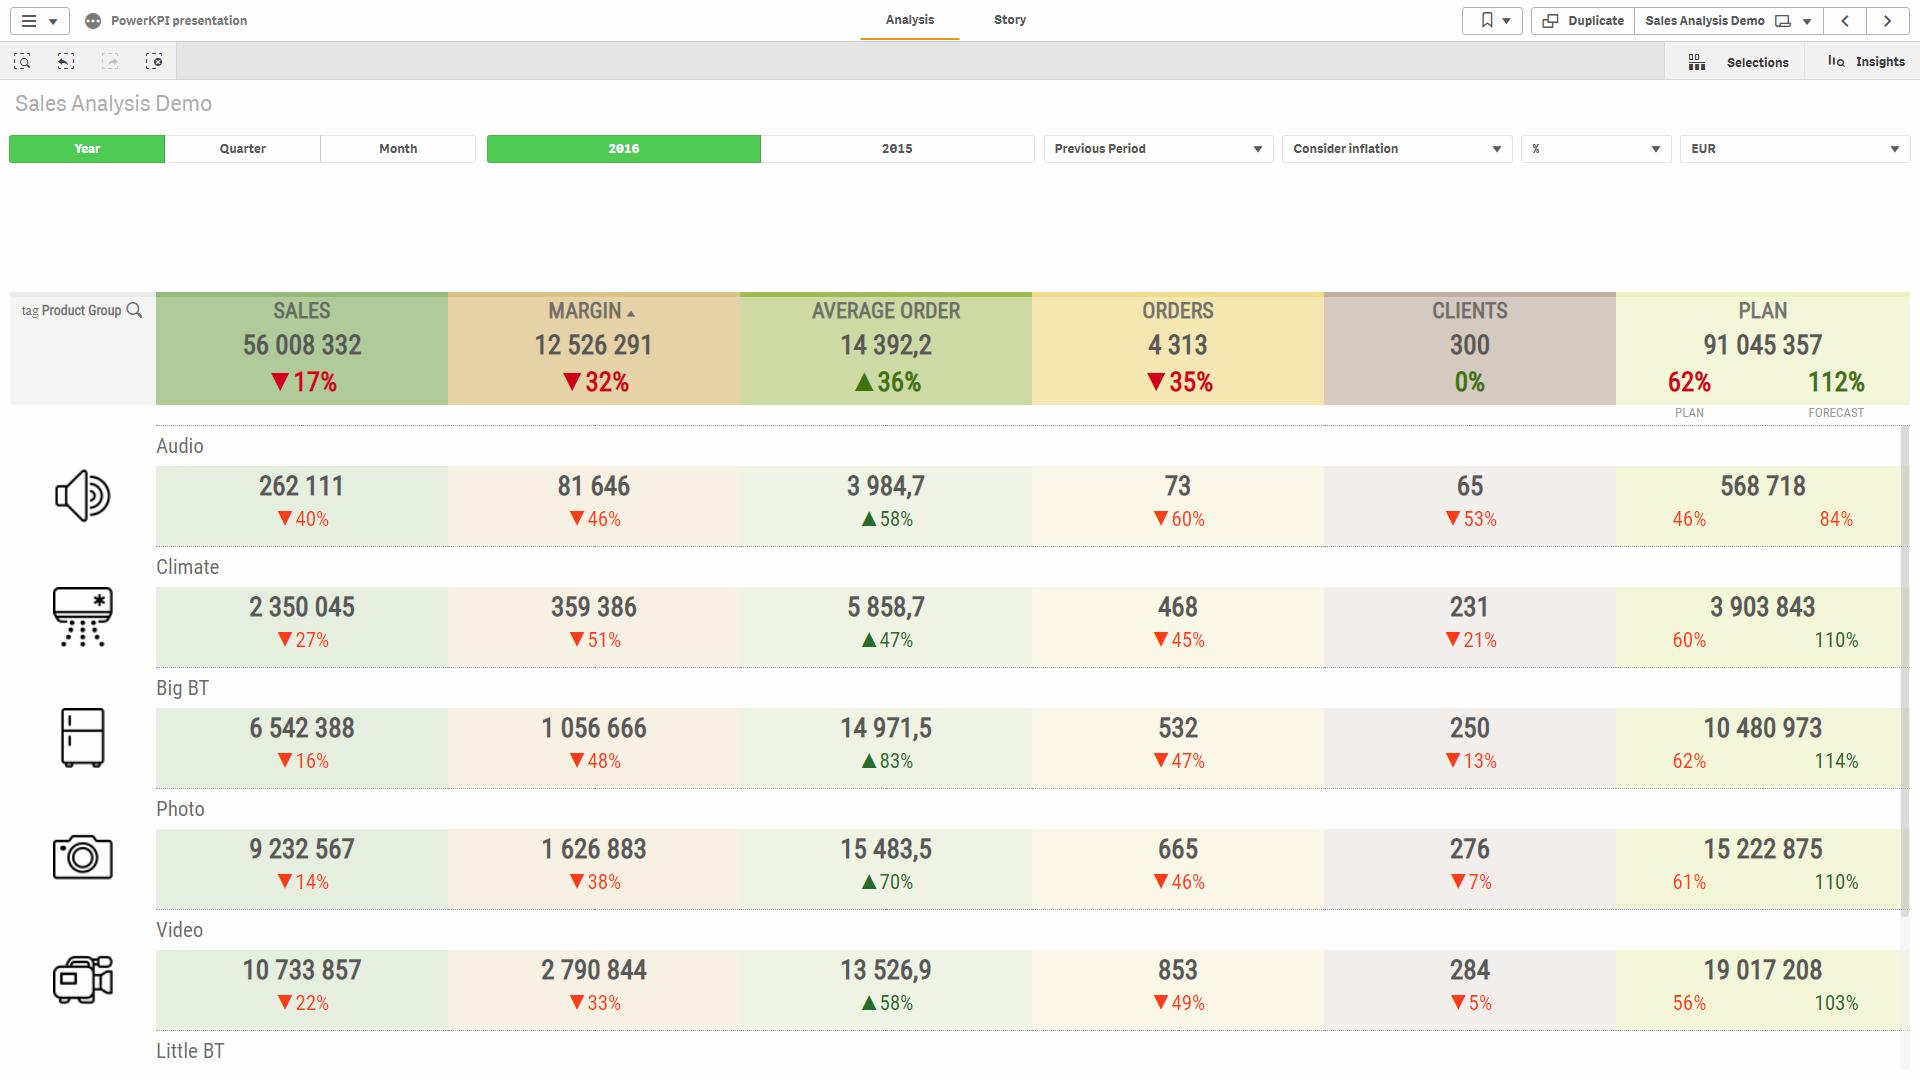 Extension for Qlik Sense to build dashboards | Power KPI